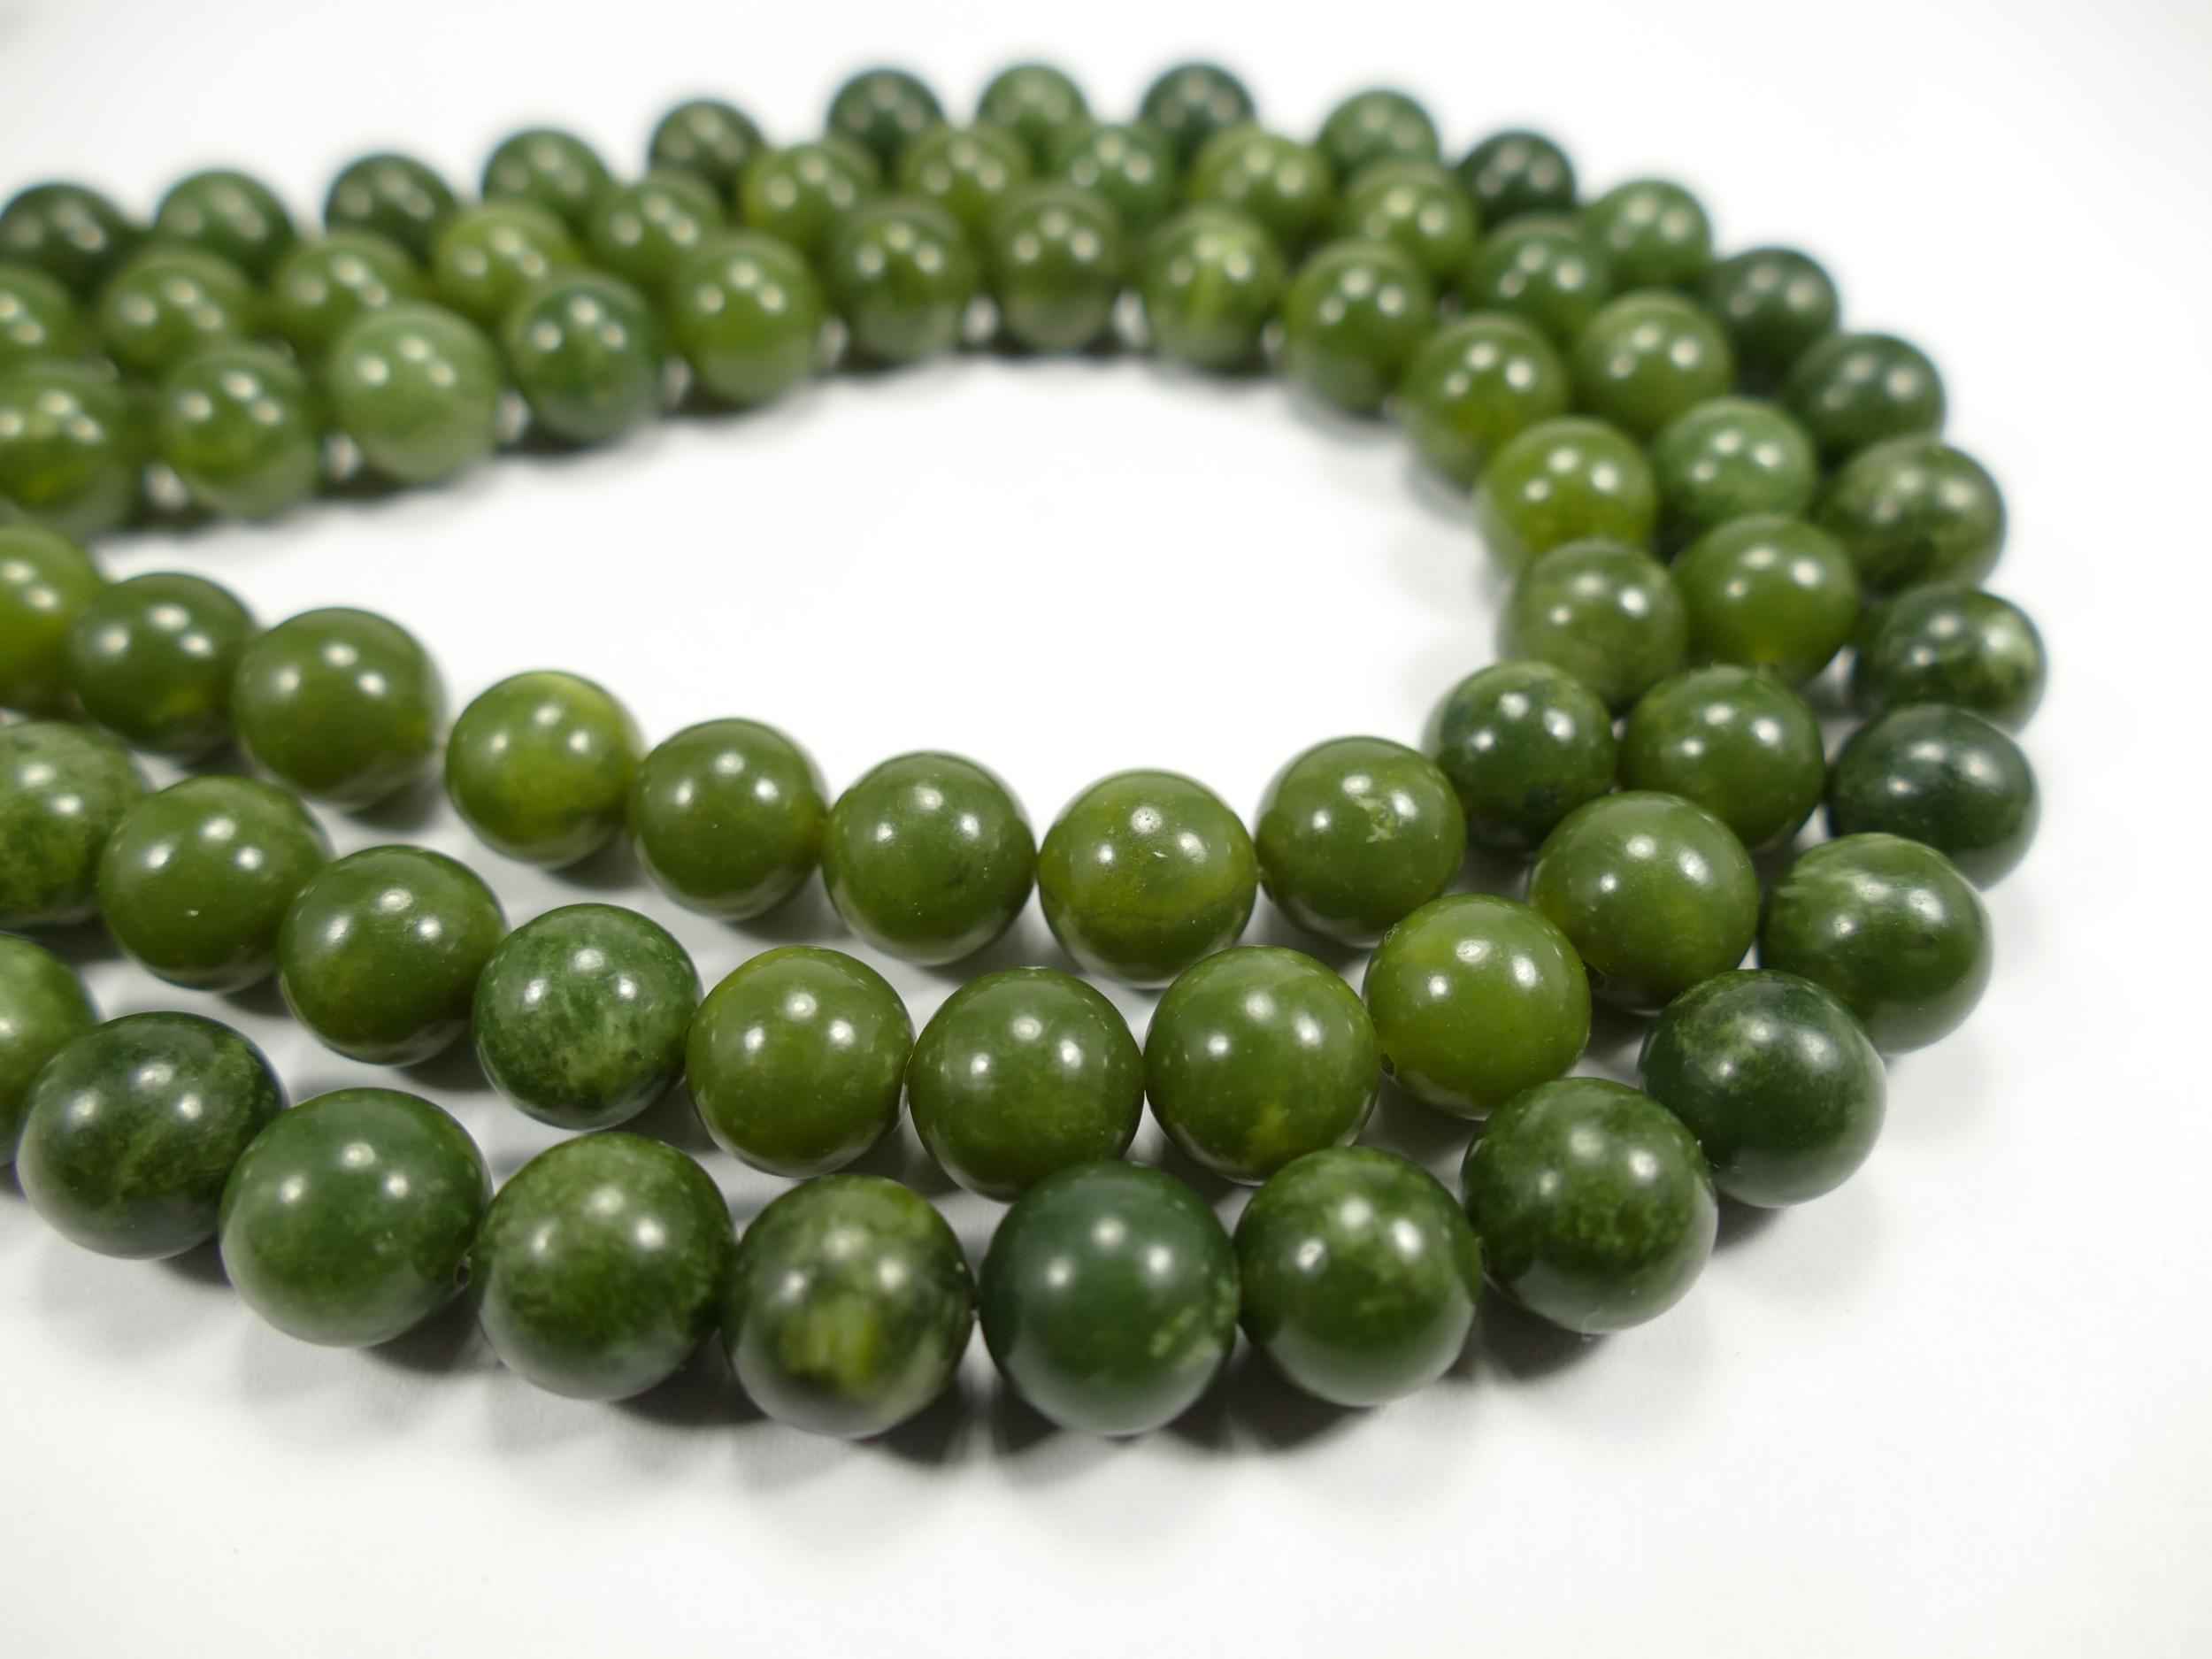 Dendritic Vert Jade Perles 15.5 Pouces, 10 mm perles rondes 308054006 10.3 mm